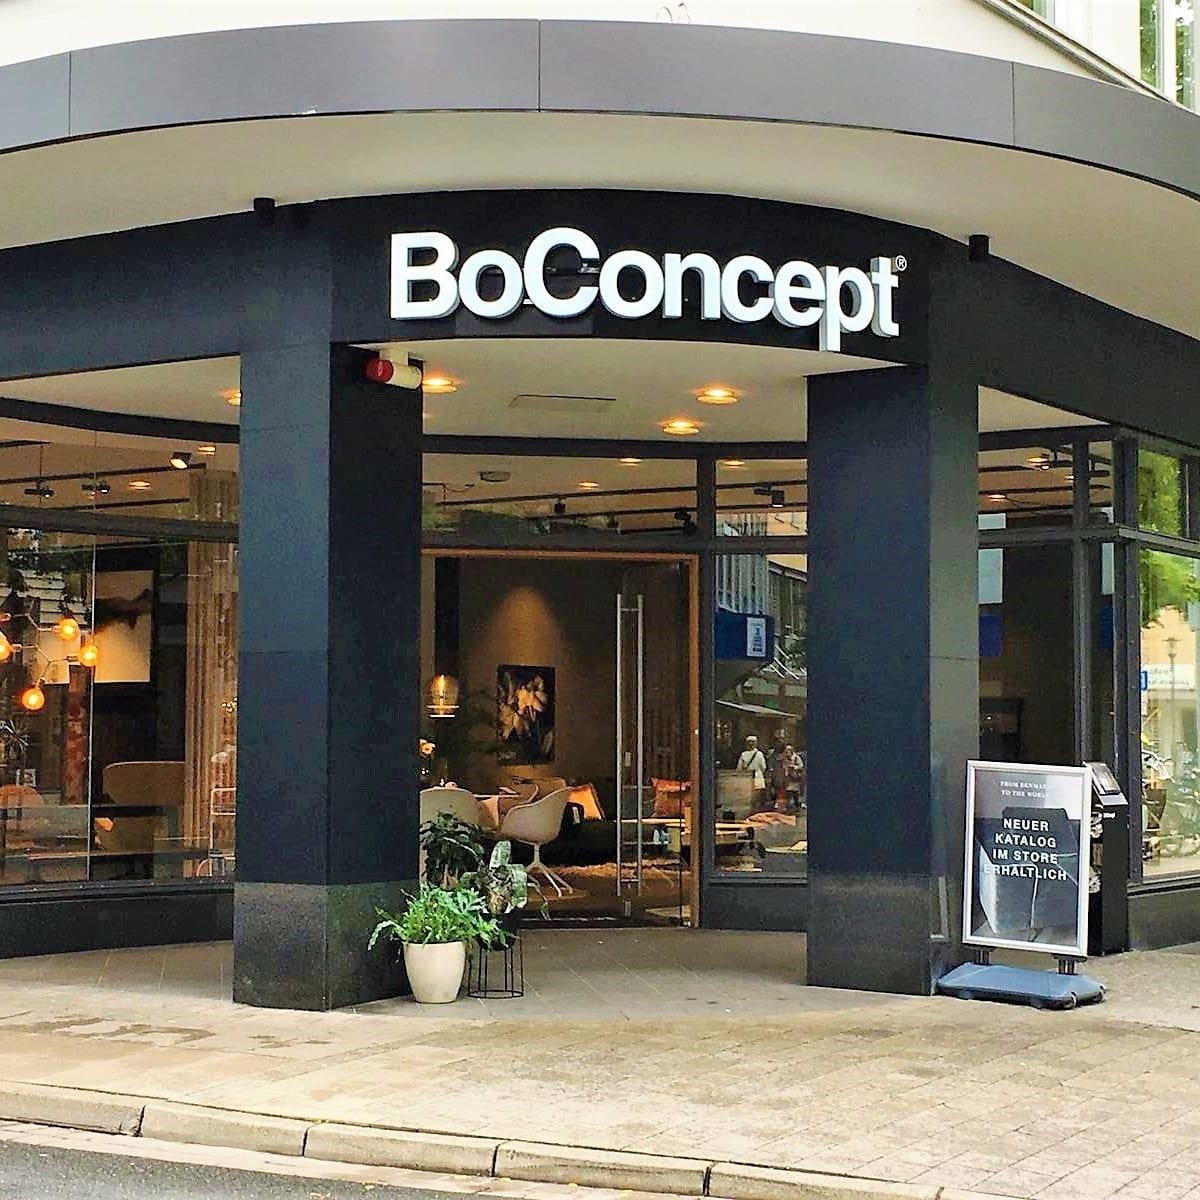 style hannover boconcept hannover 1 - BoConcept Hannover - dänisches Interieur-Design